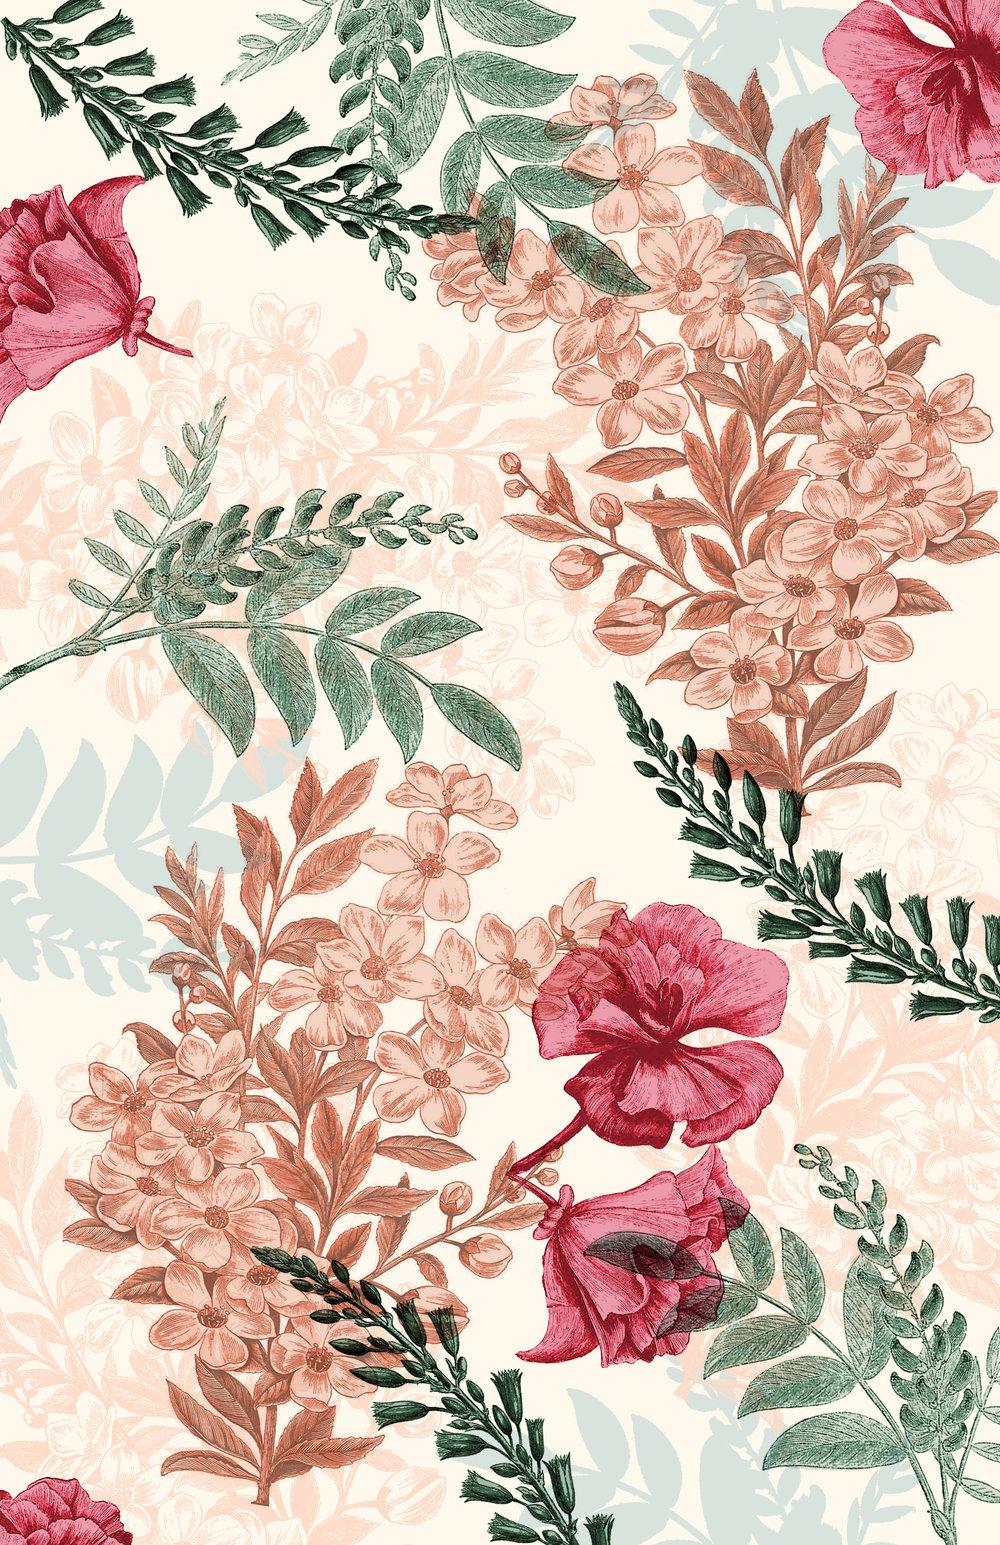 floral+illustrations+overlays.jpg